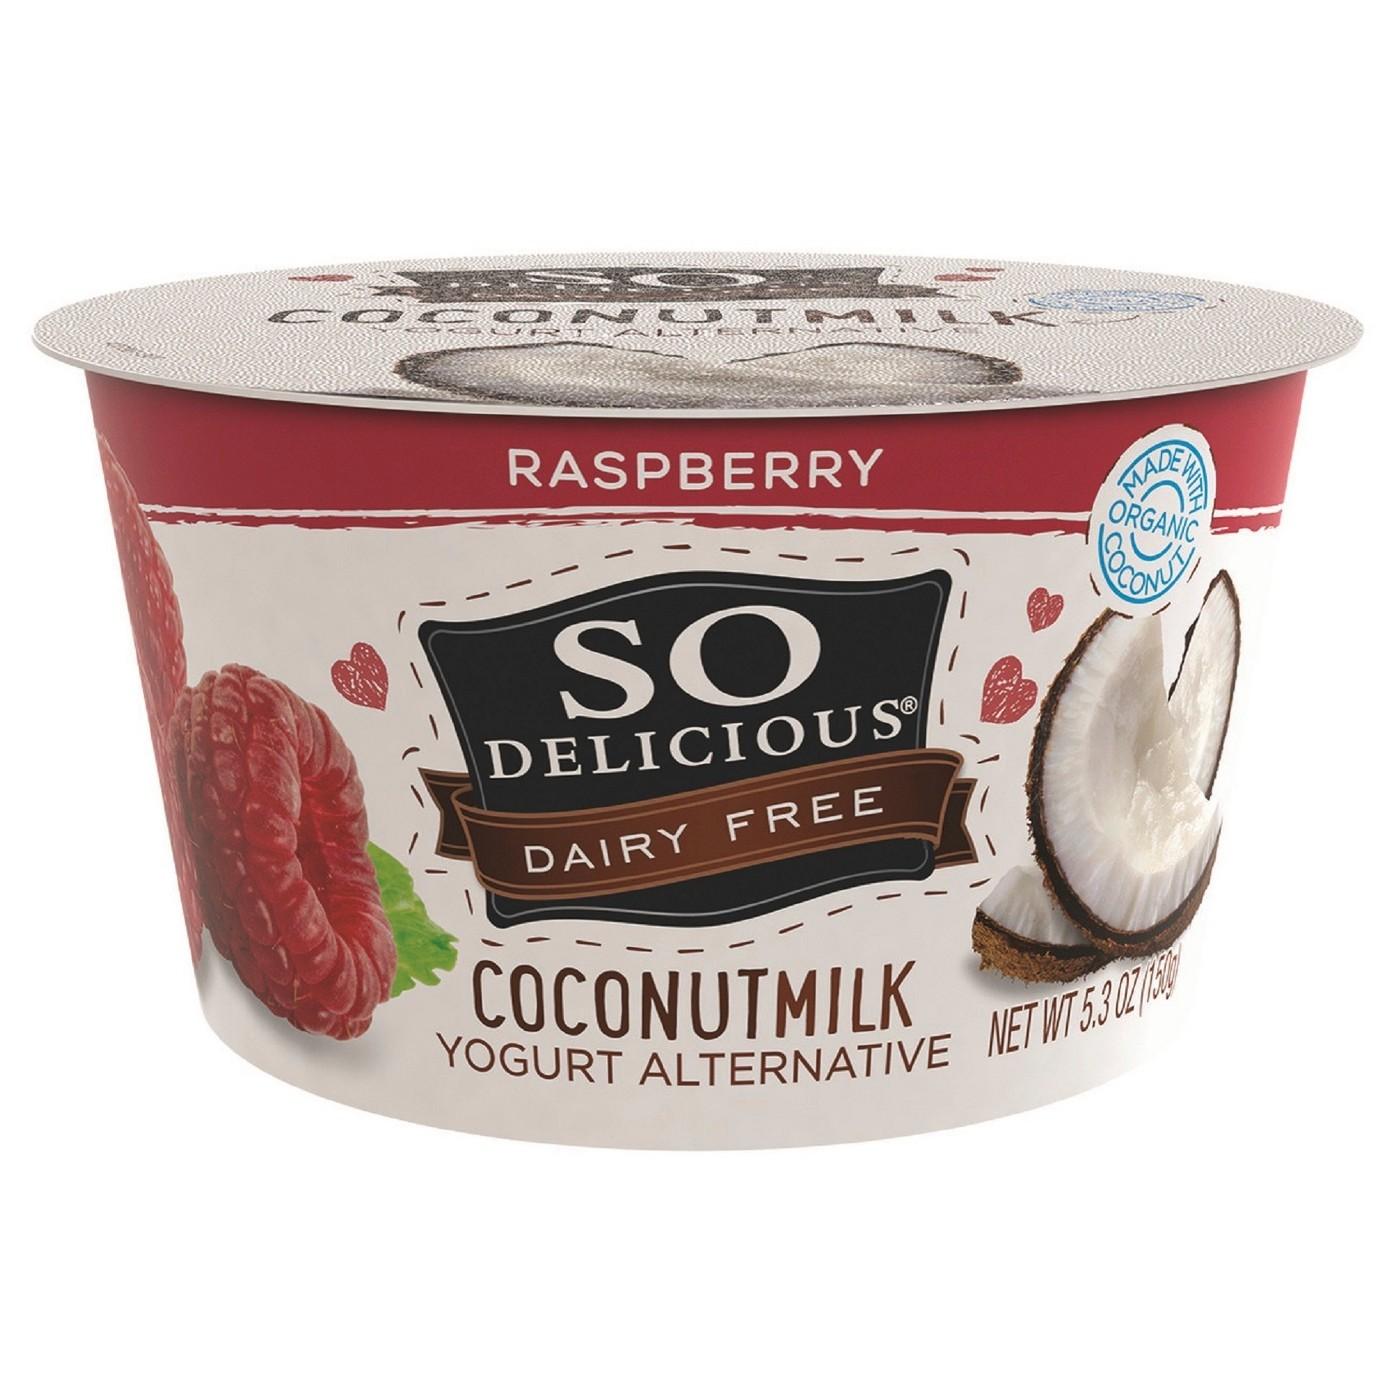 So Delicious Dairy free Coconut Milk Raspberry Yogurt - 5.3oz - image 1 of 1